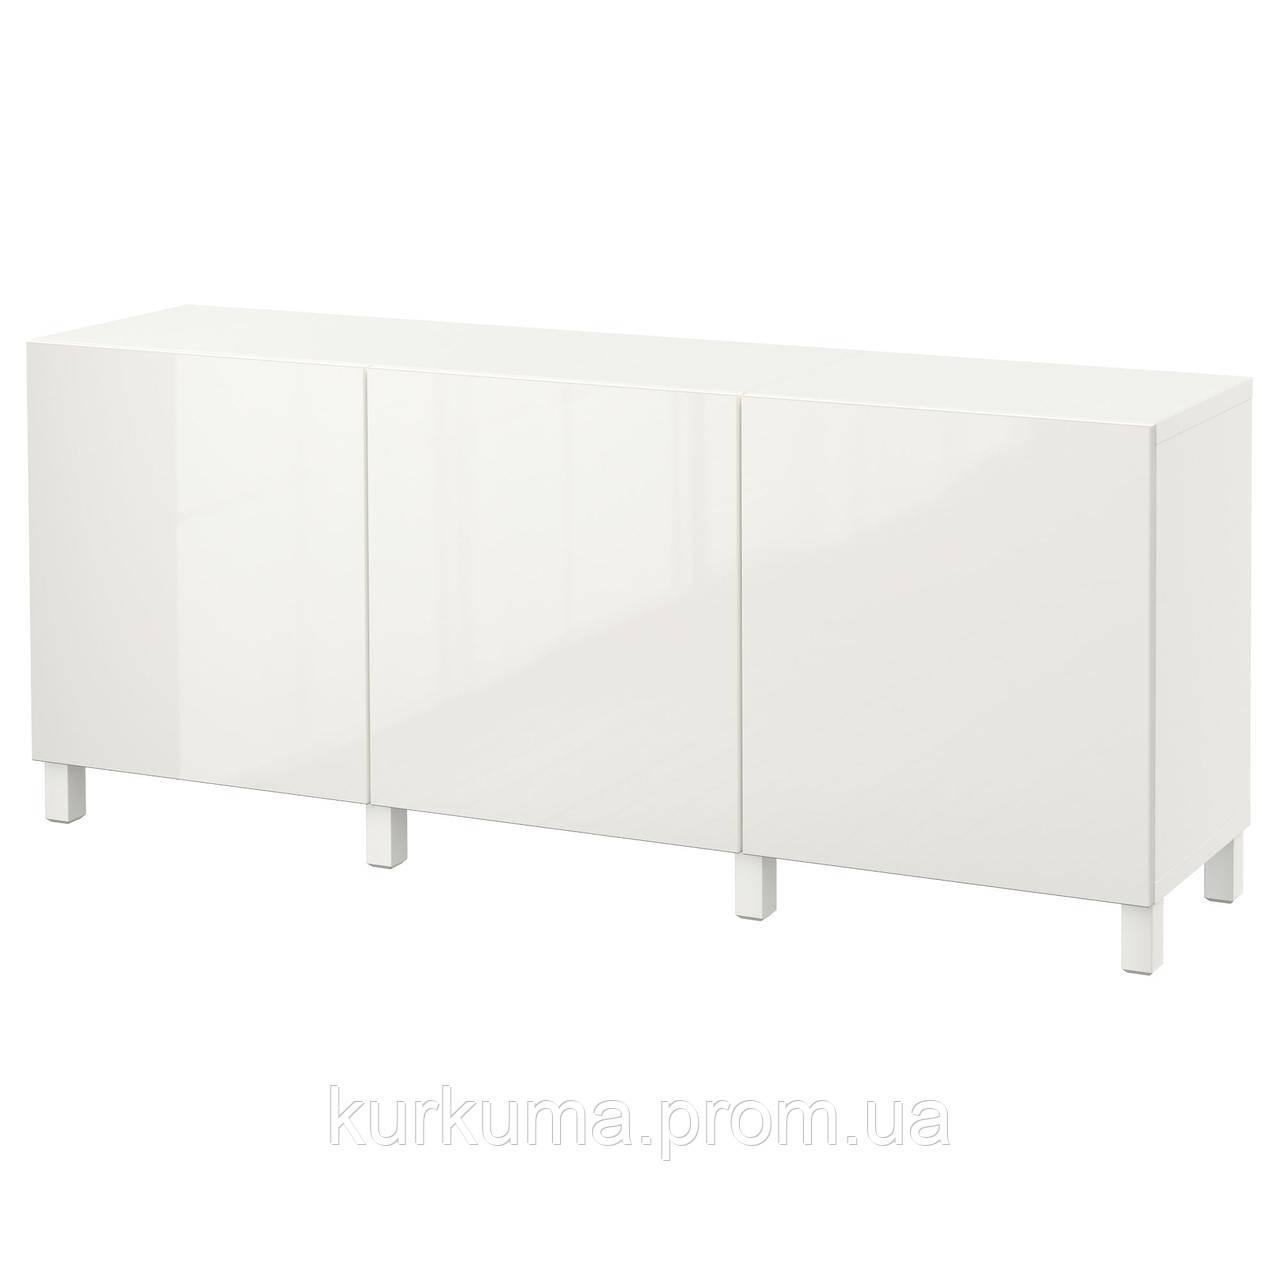 IKEA BESTA Тумба, белый, Сельсвикен глянцевый/белый  (891.398.19)